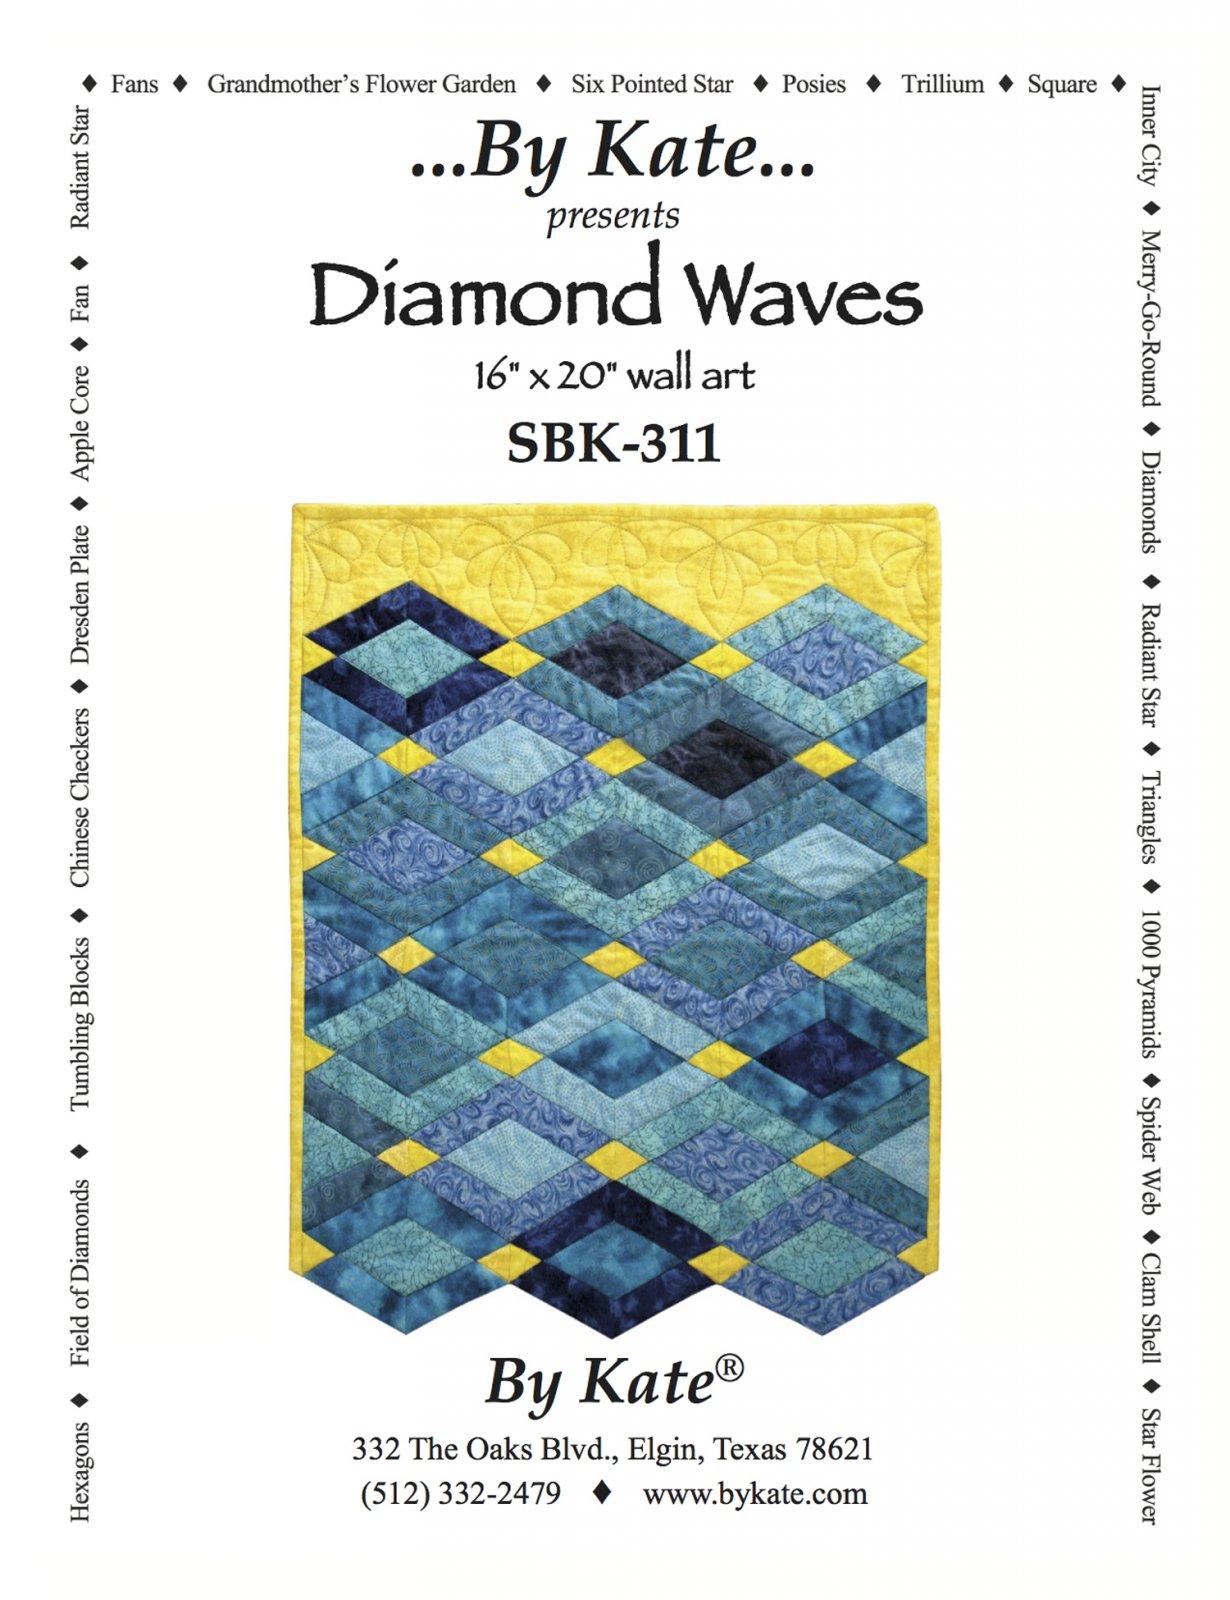 Diamond Waves Wall Hanging